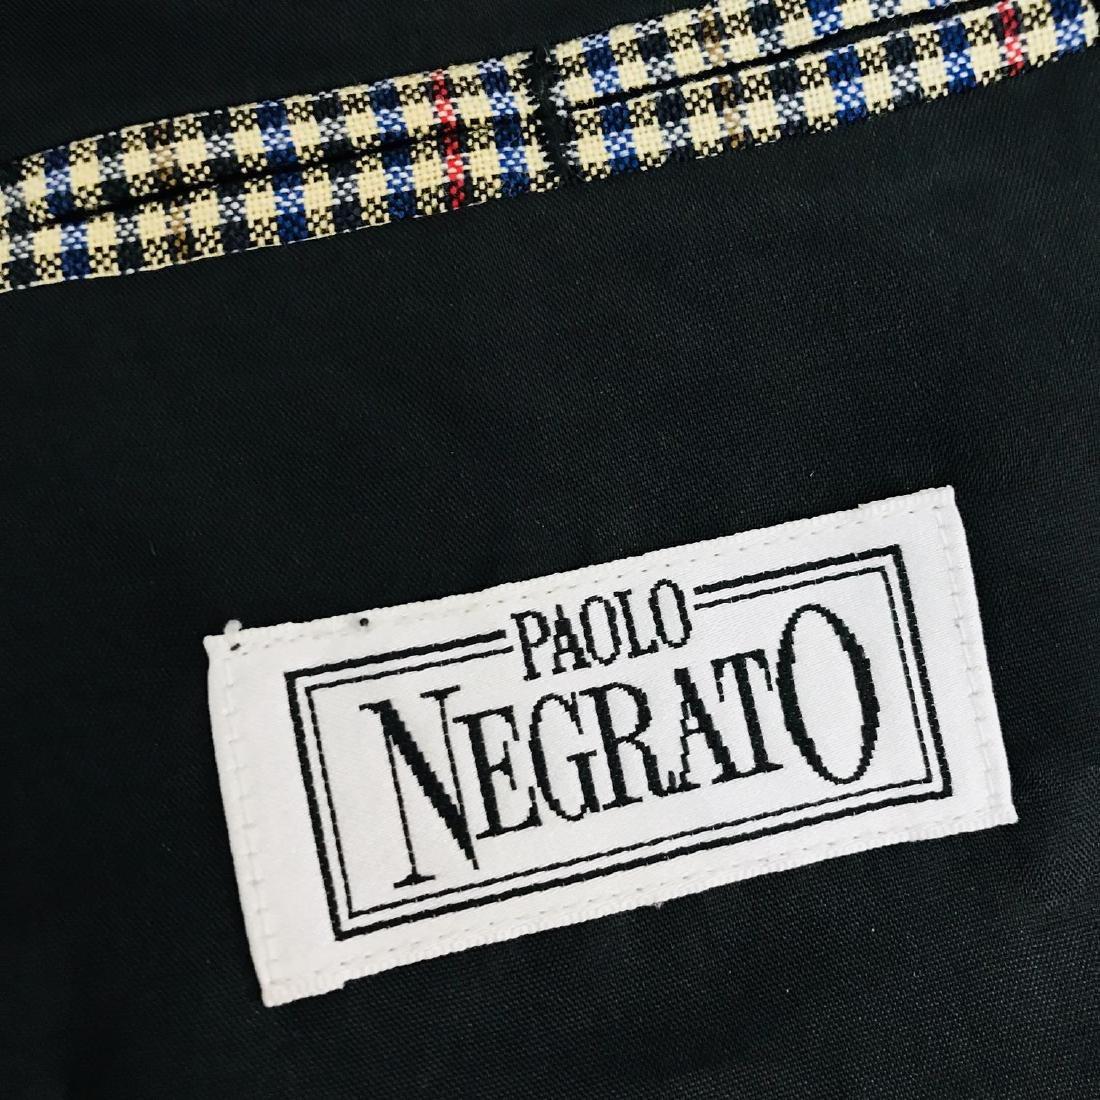 Vintage Men's Paolo Negrato Jacket Blazer Size US 40 - 7